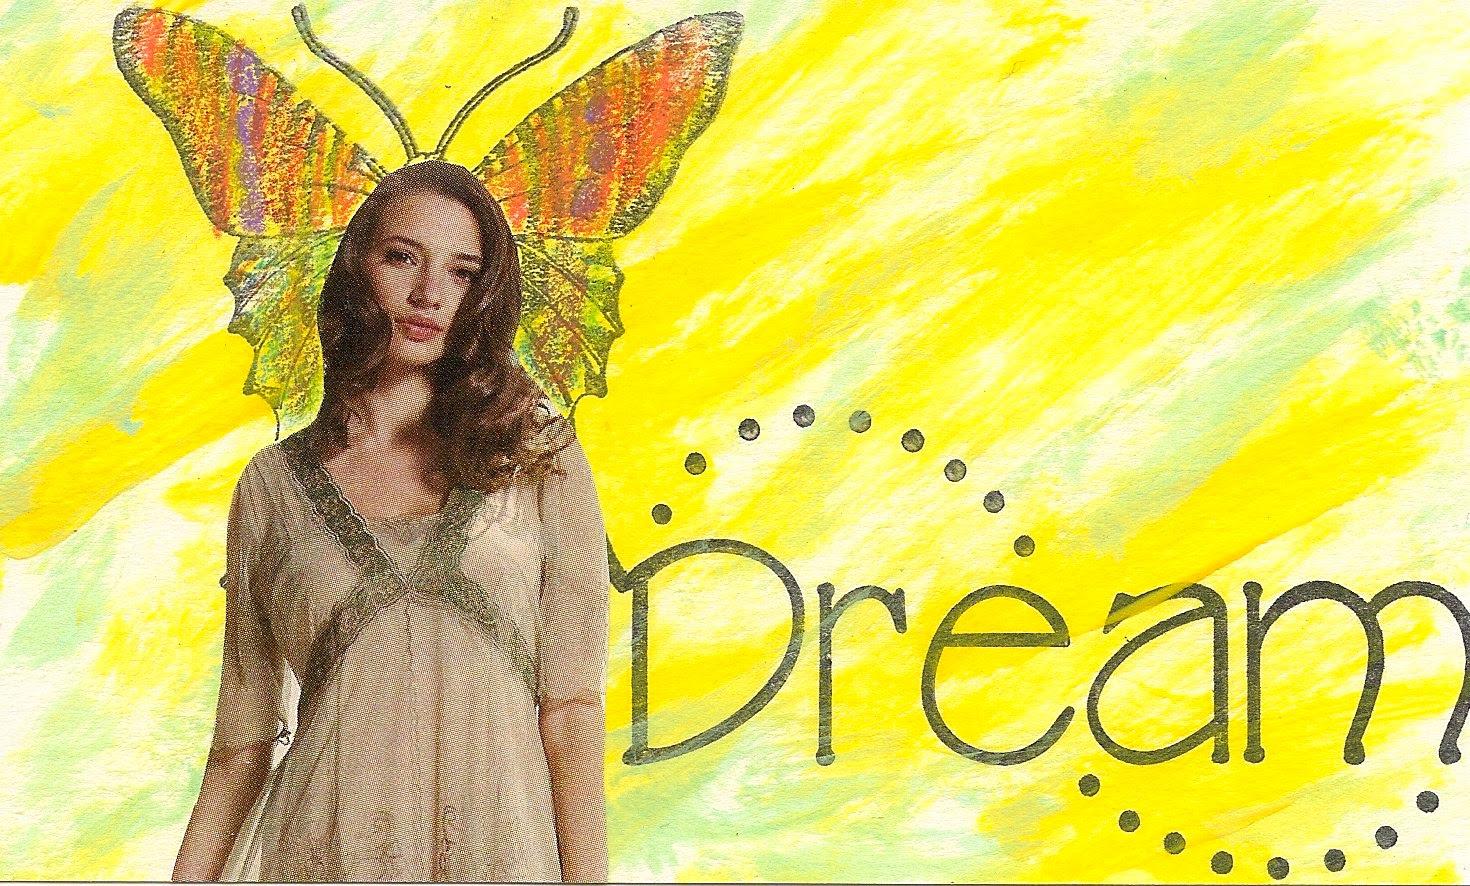 ICAD Dream